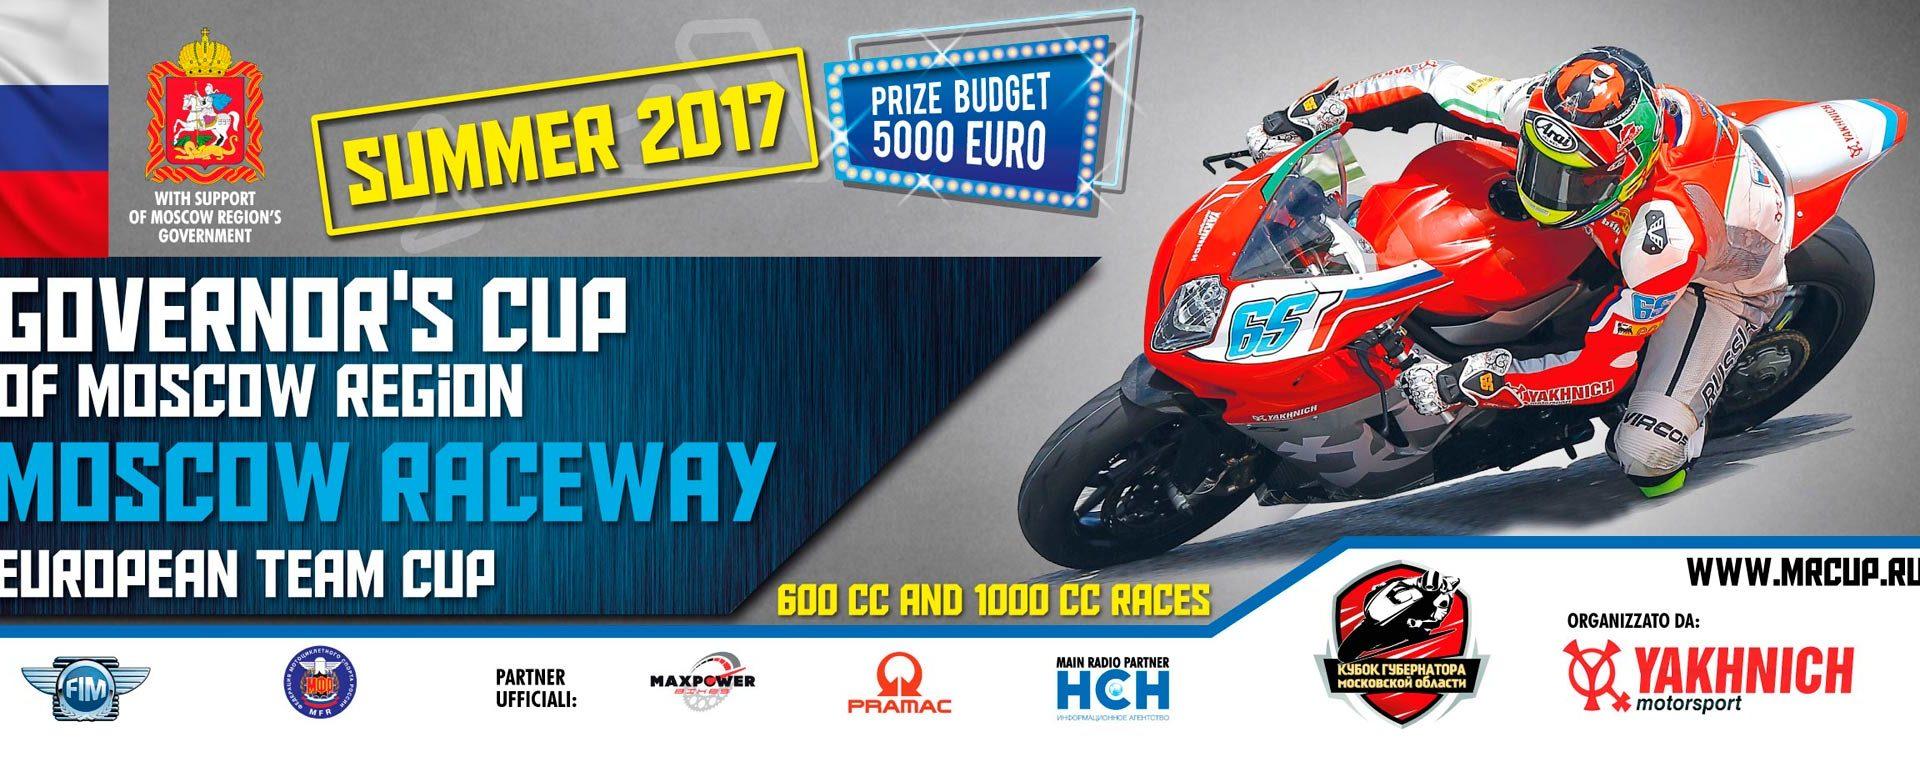 Кубок губернатора Московской области 2017 на Motor Bike Expo 2017 в Вероне!